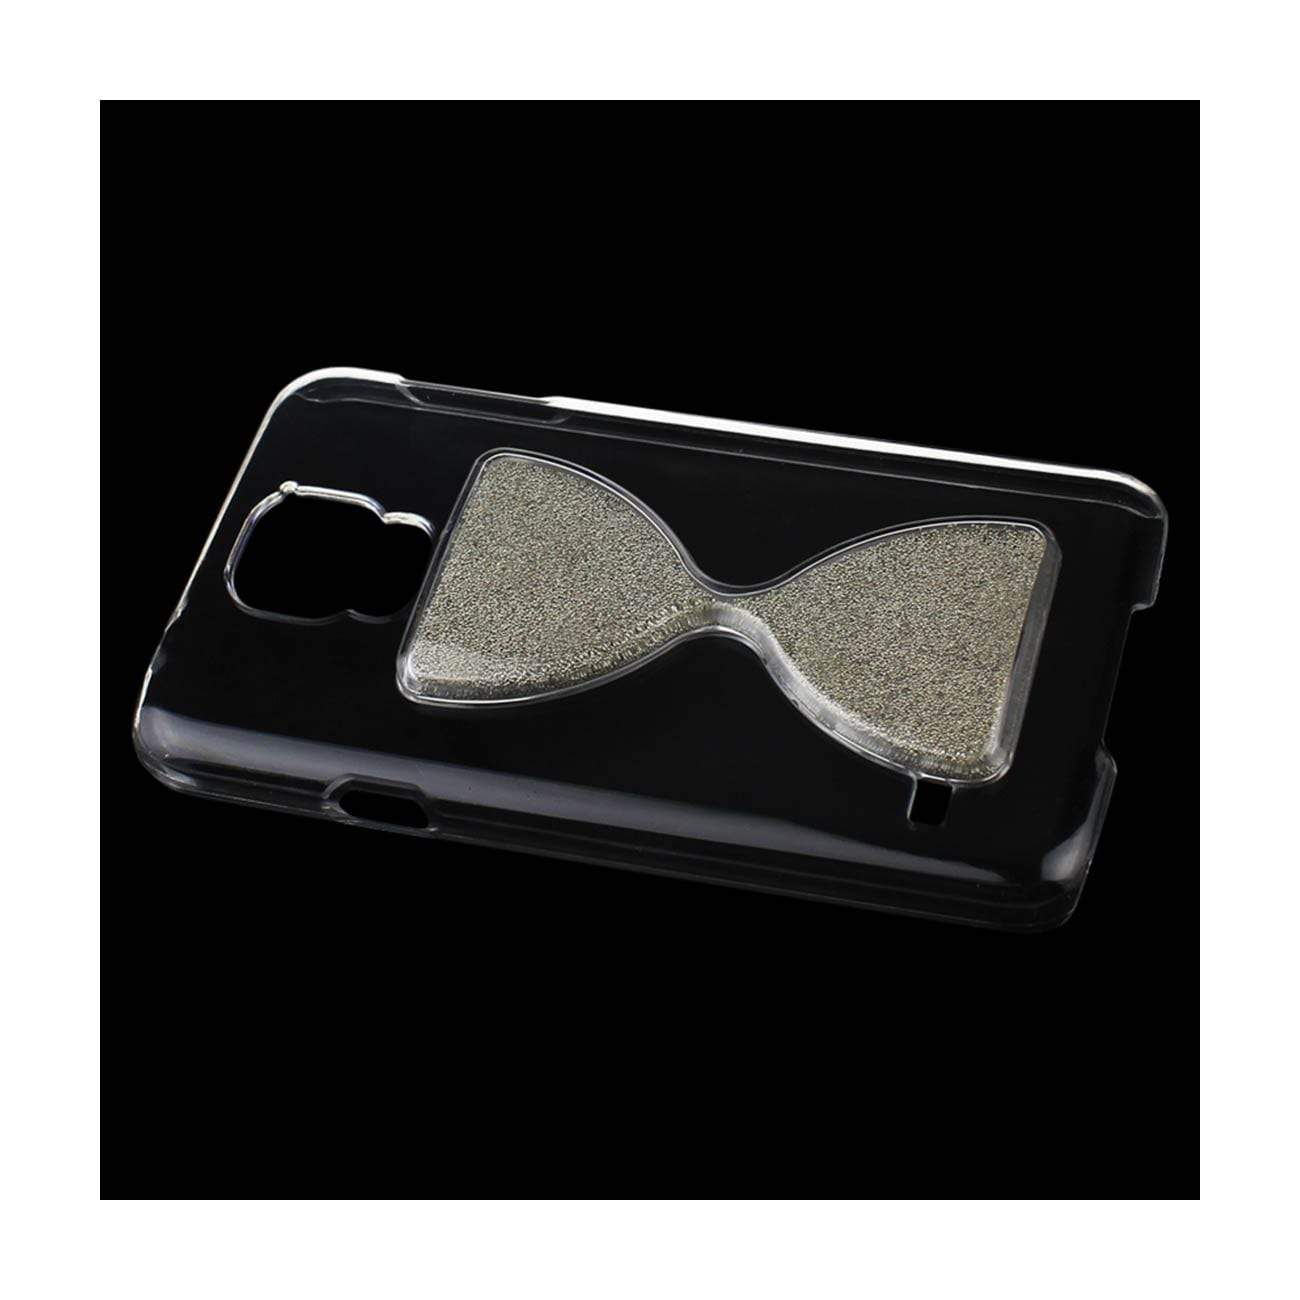 SAMSUNG GALAXY S5 3D SAND CLOCK CLEAR CASE IN SILVER